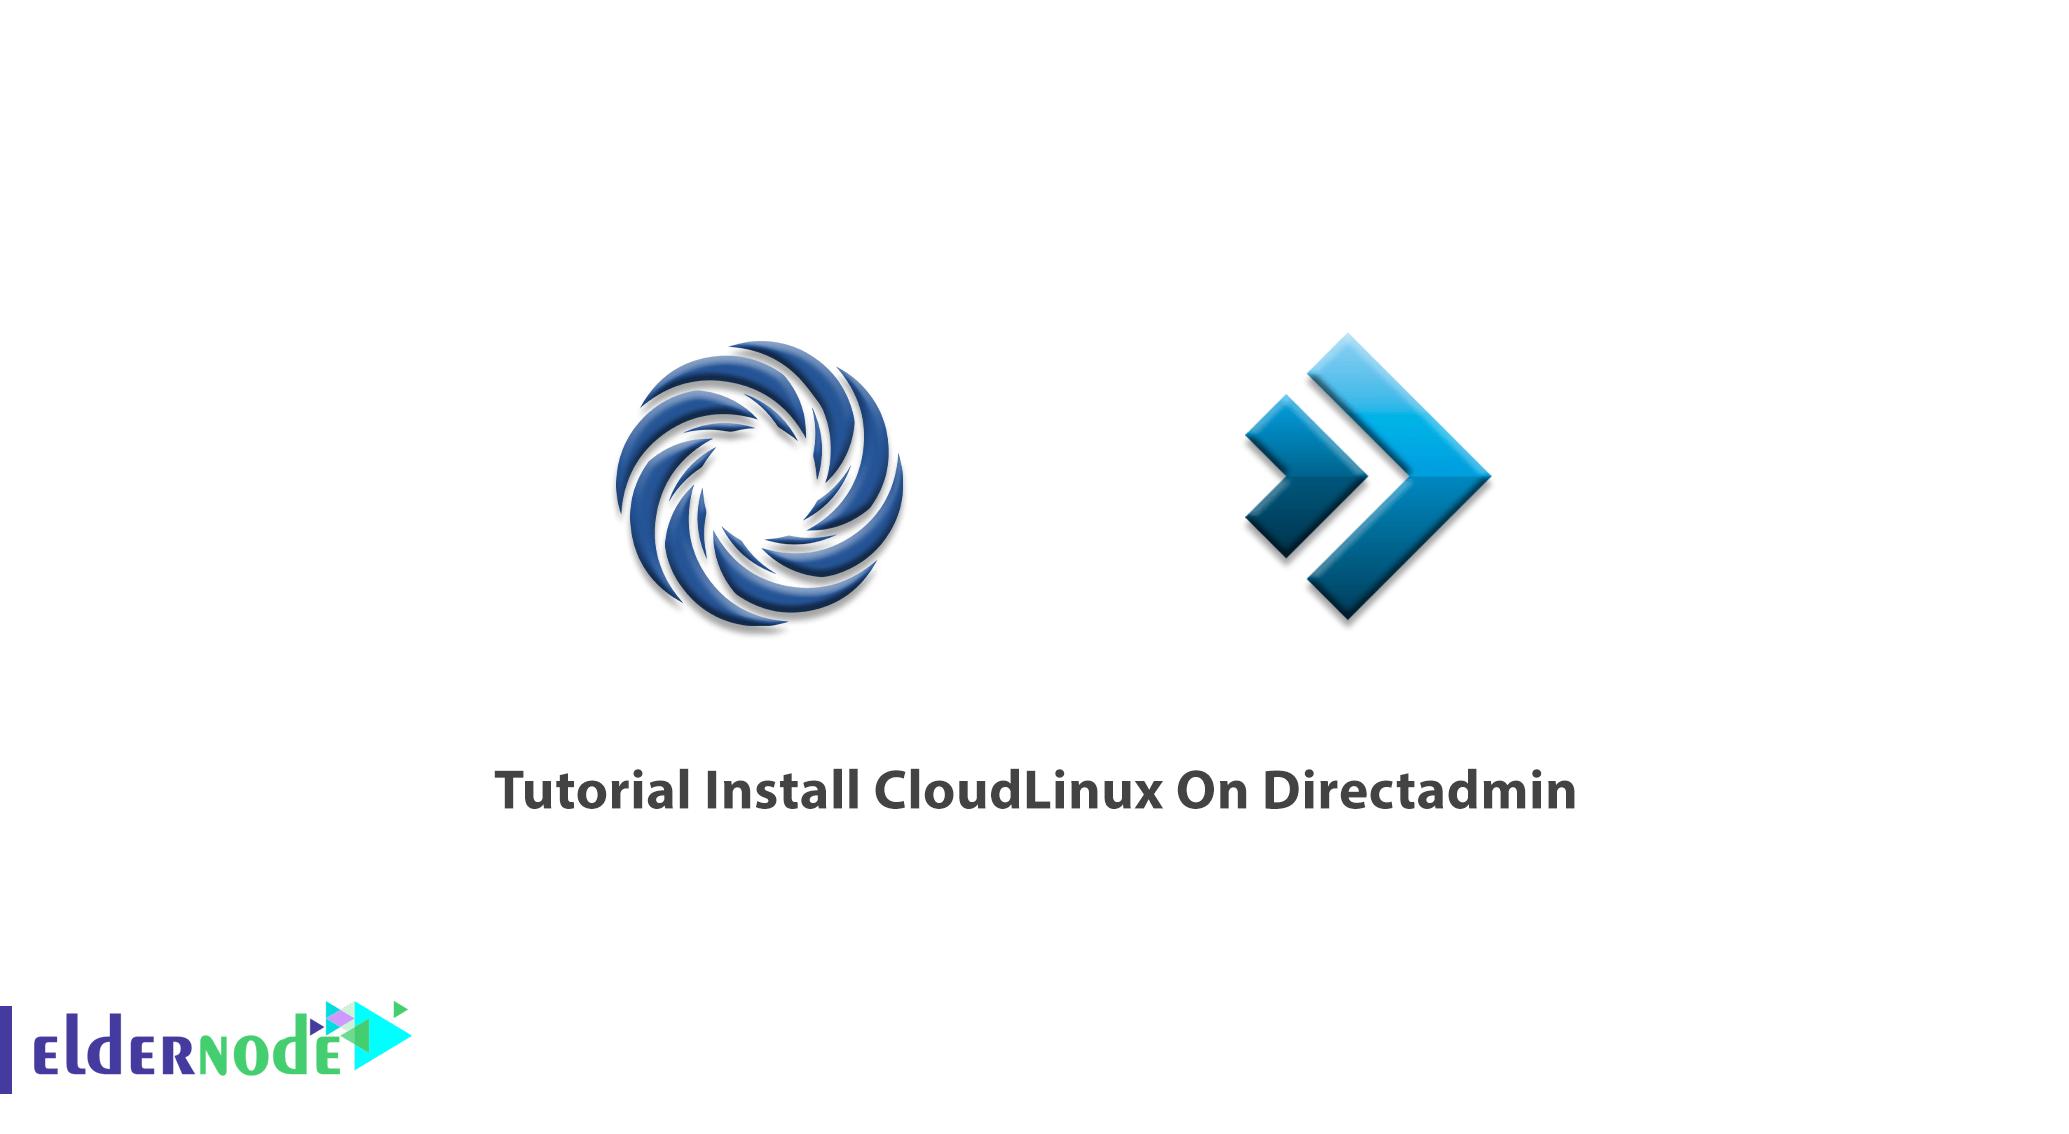 Tutorial Install CloudLinux On Directadmin